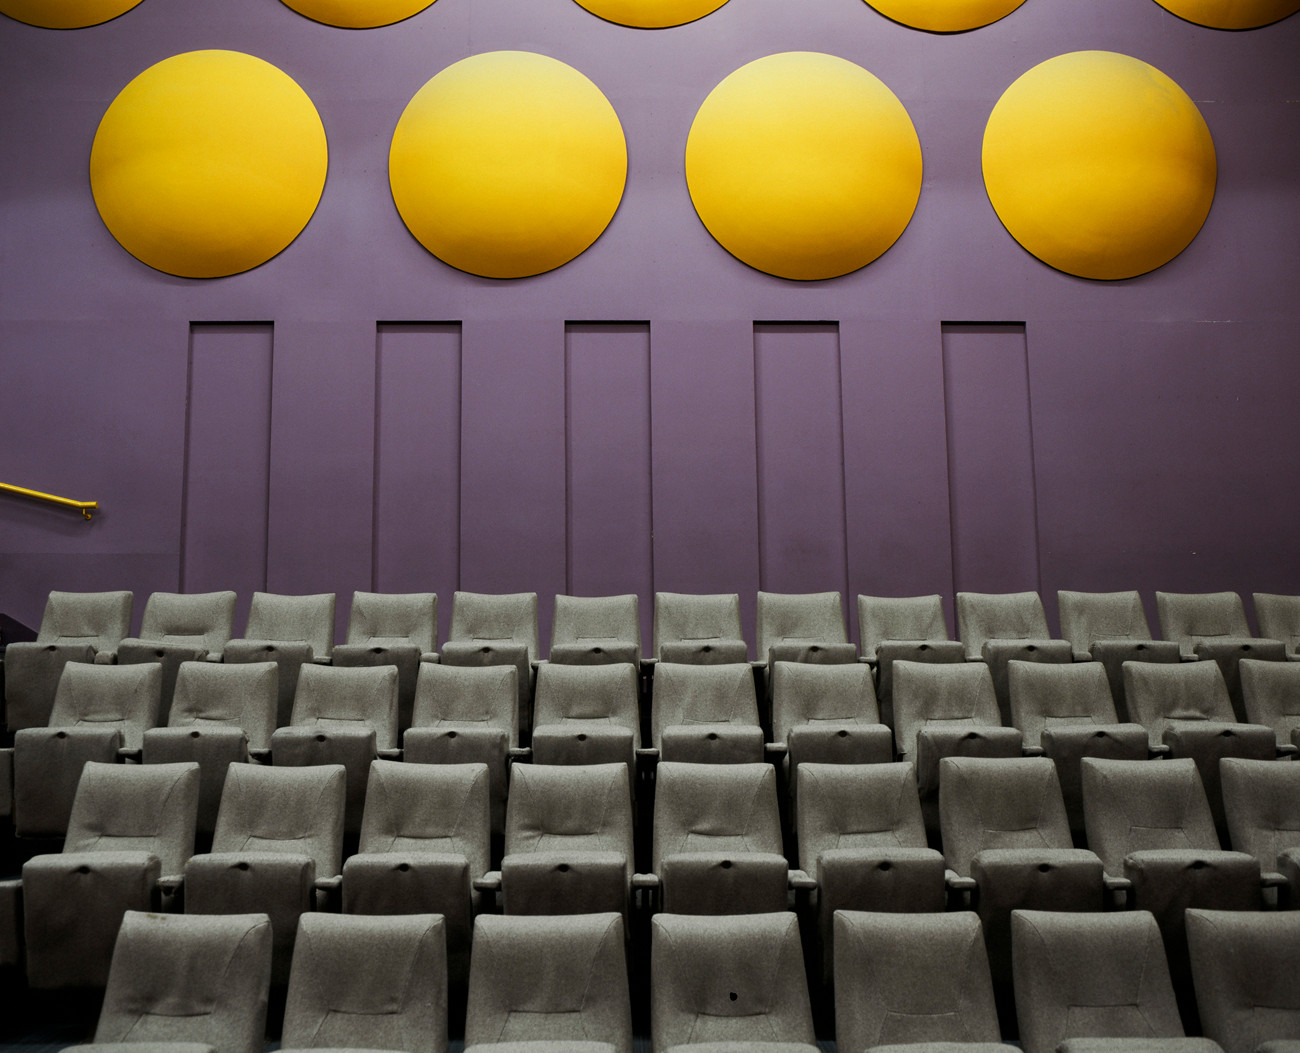 Conservatoire-71520004.jpg